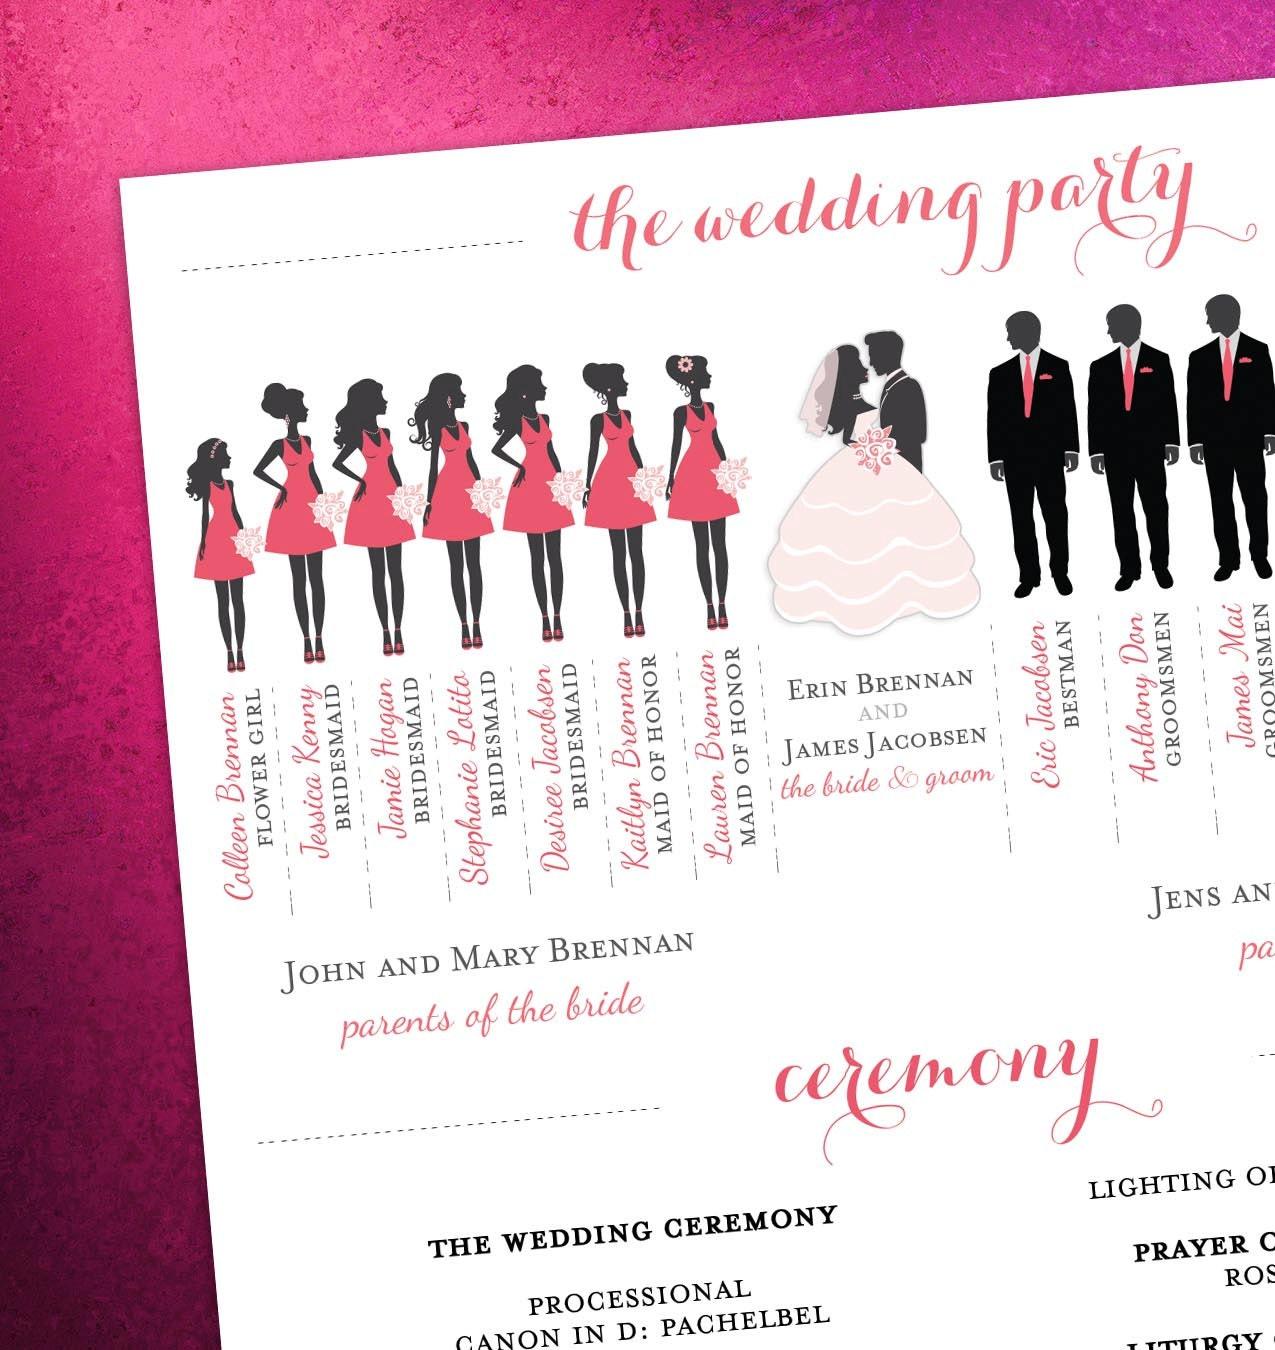 Description Modern Day Wedding Program With Bridal Party